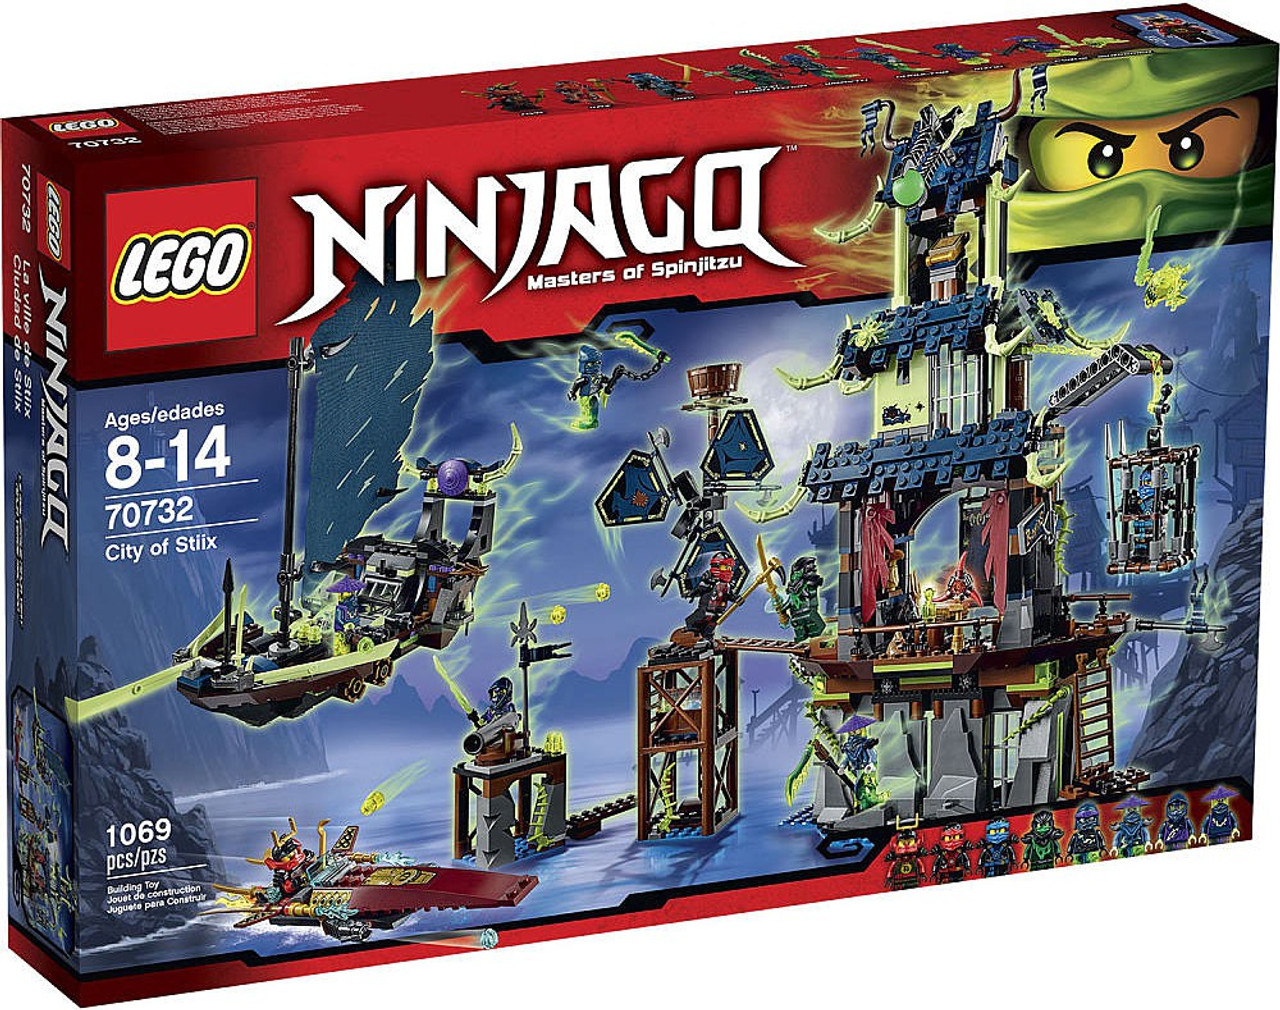 Stiix Package Exclusive Ninjago Of Lego Set70732damaged City dQthxrsBC